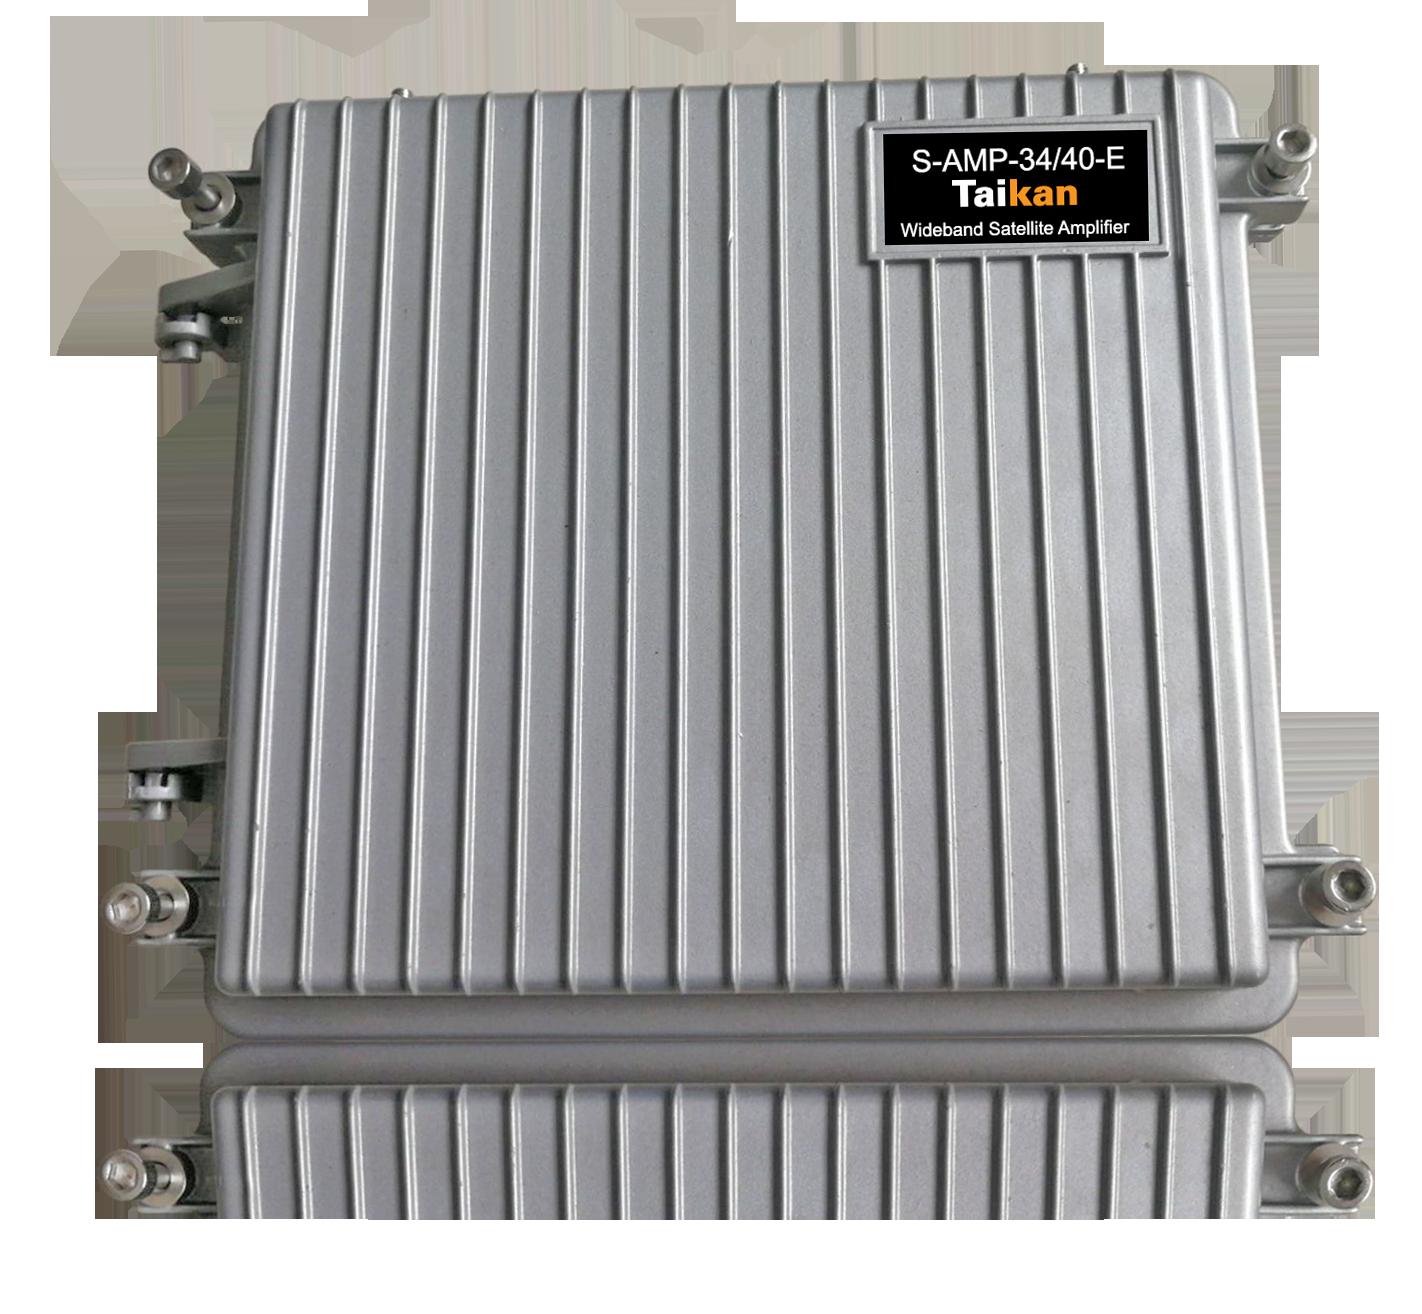 Satellite Amplifier 1 terrestrial and satellite signals